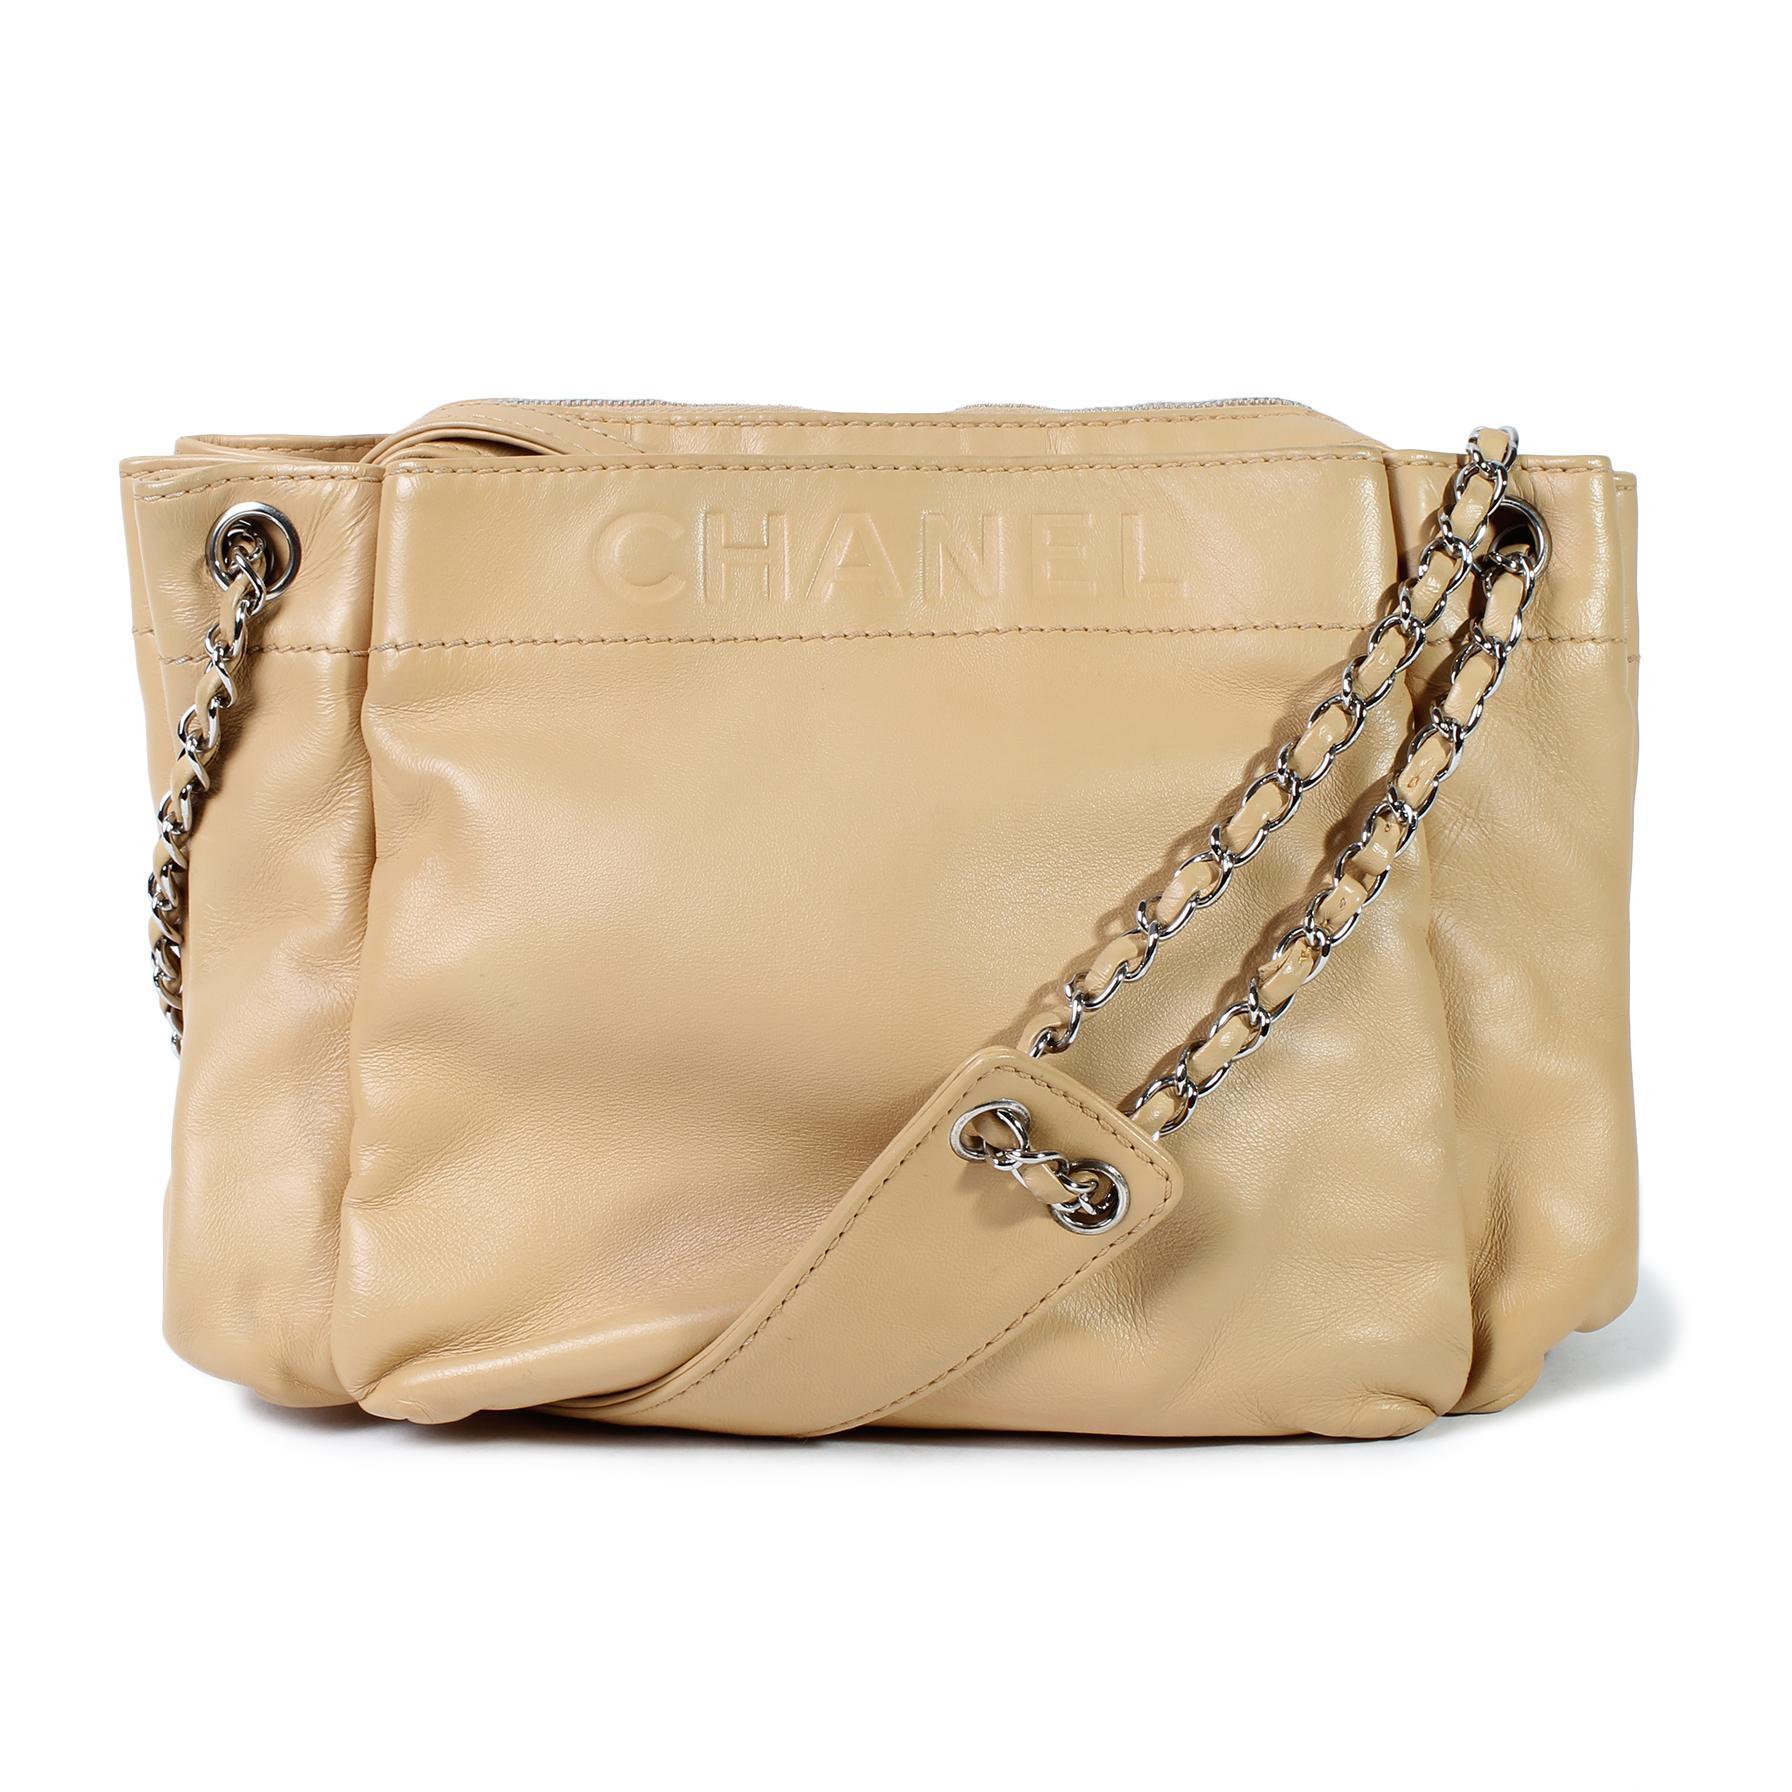 Chanel Logo Embossed Chain Handbag